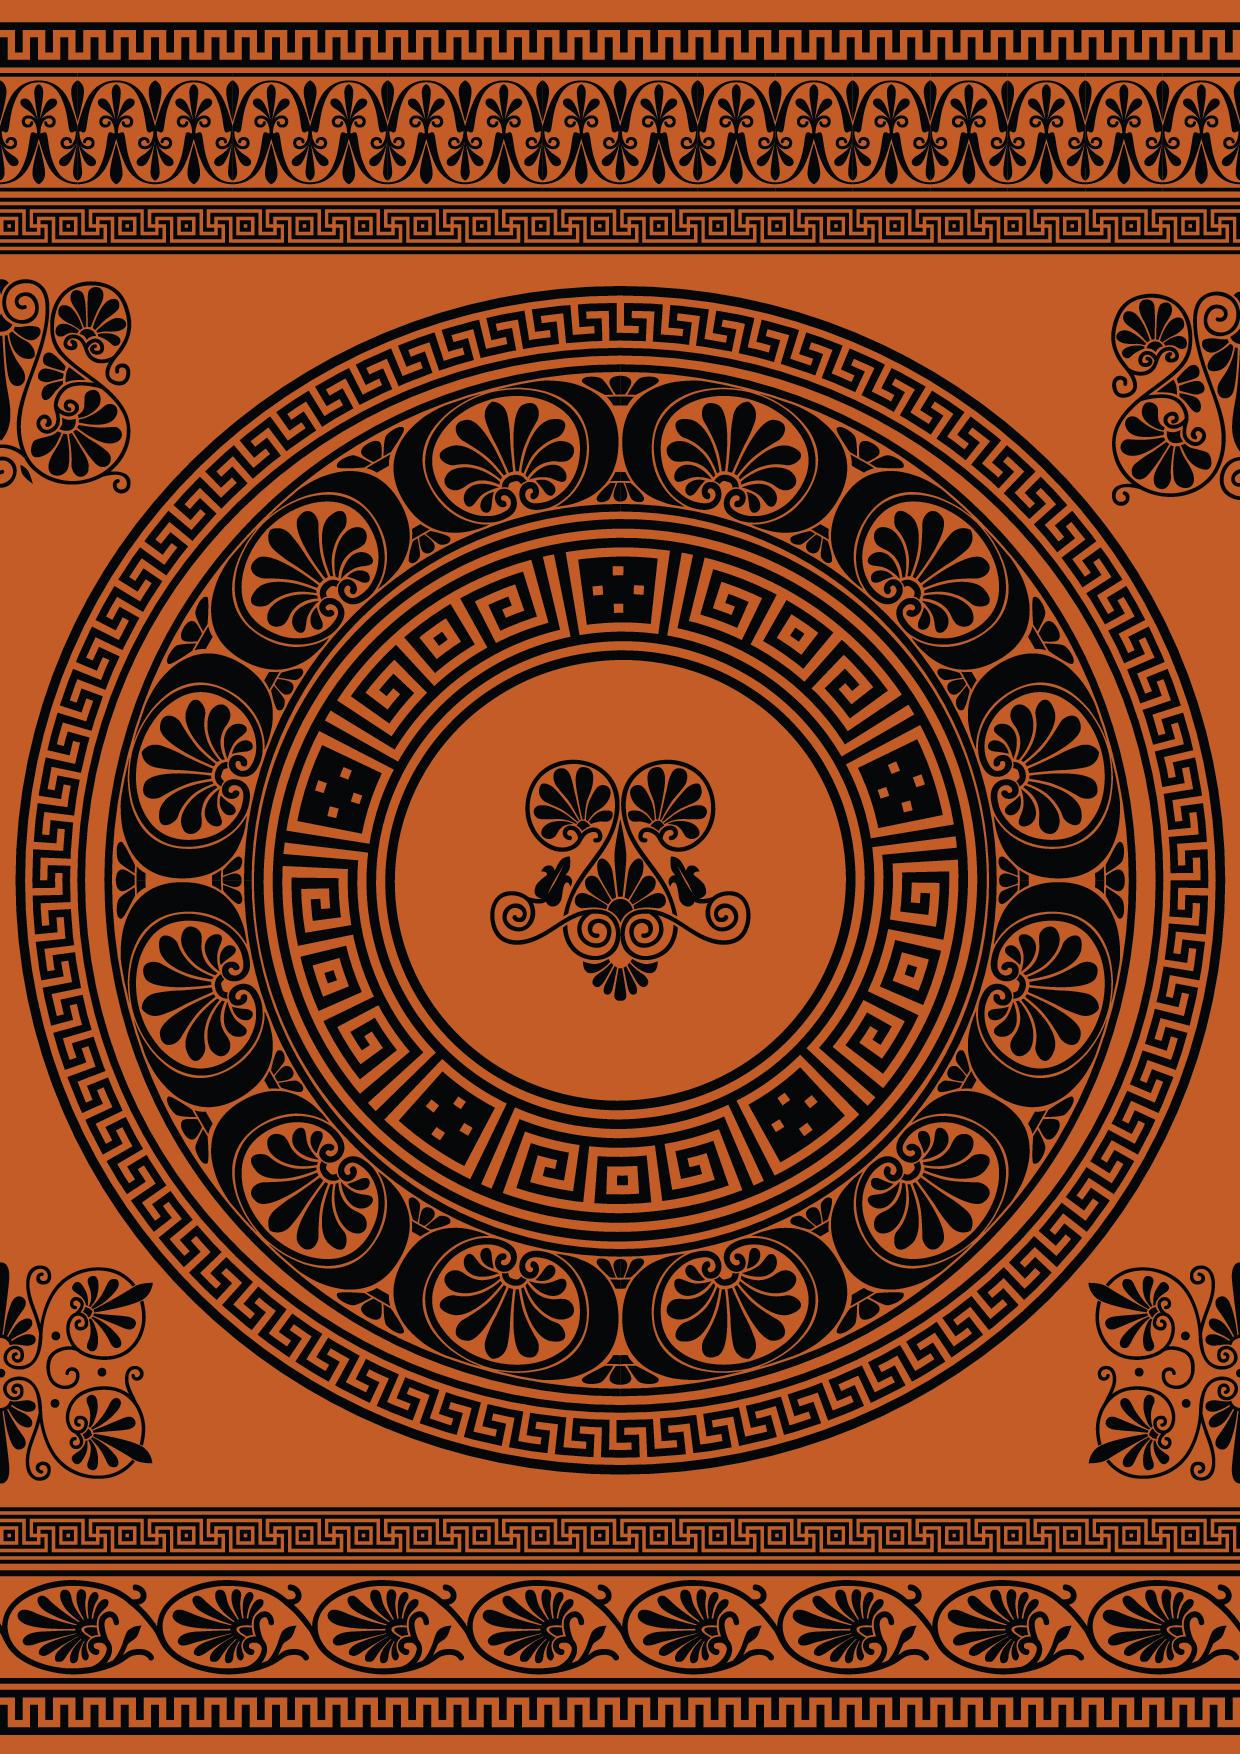 greek ornamental vectors and brushes by nemaakos on deviantart